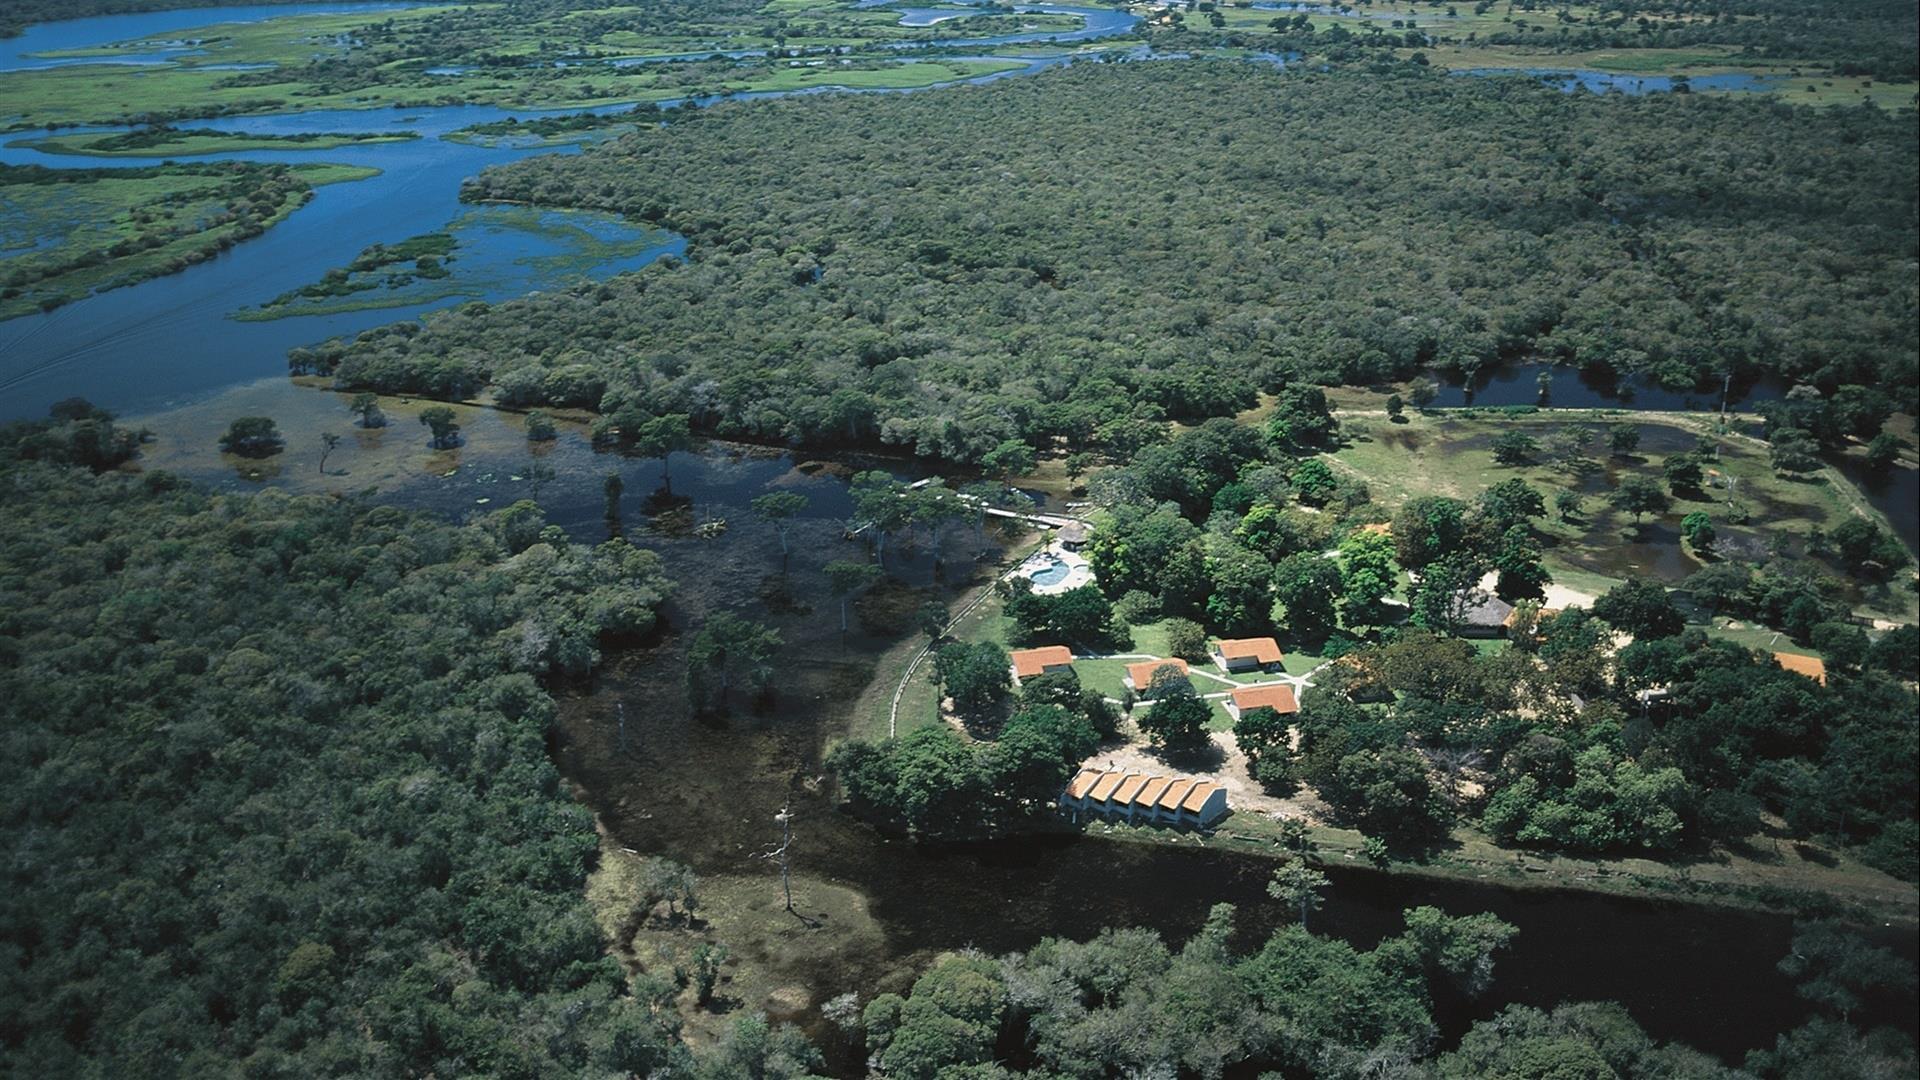 Brasilien Nord Pantanal: Landestypische Unterkunft - Pousada Rio Mutum Pantanal Eco Lodge